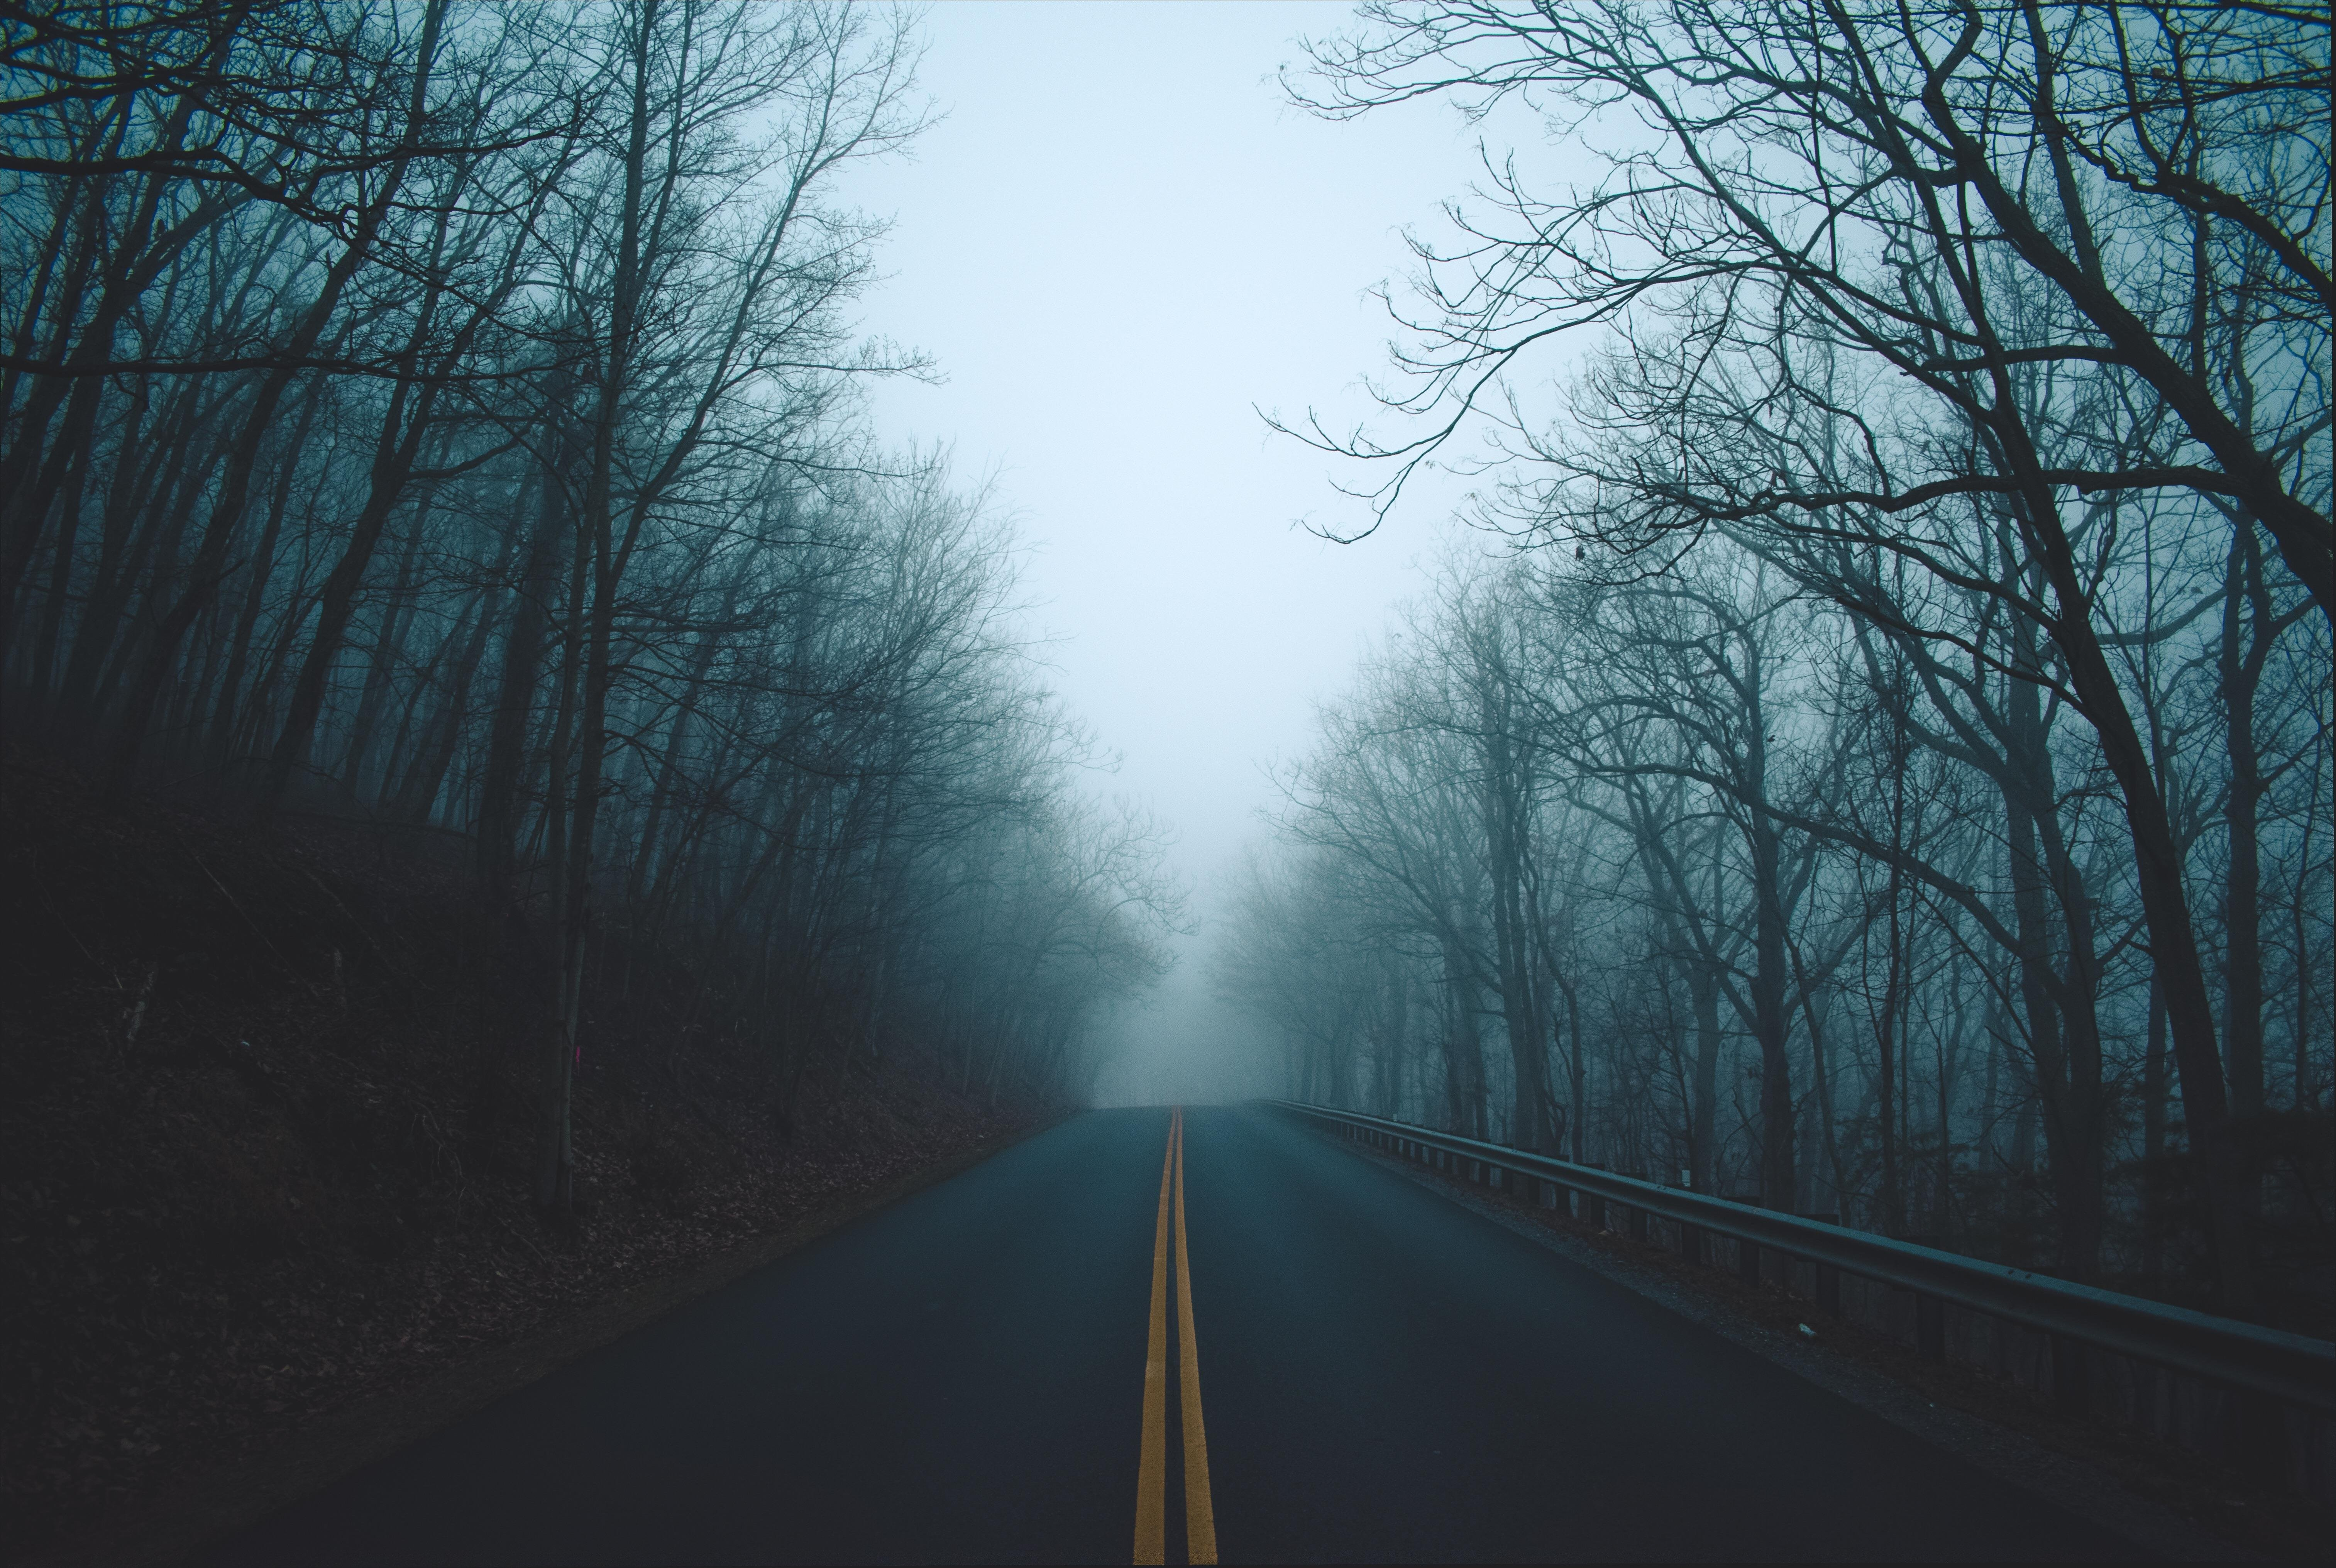 Foggy Road 4k Wallpaper